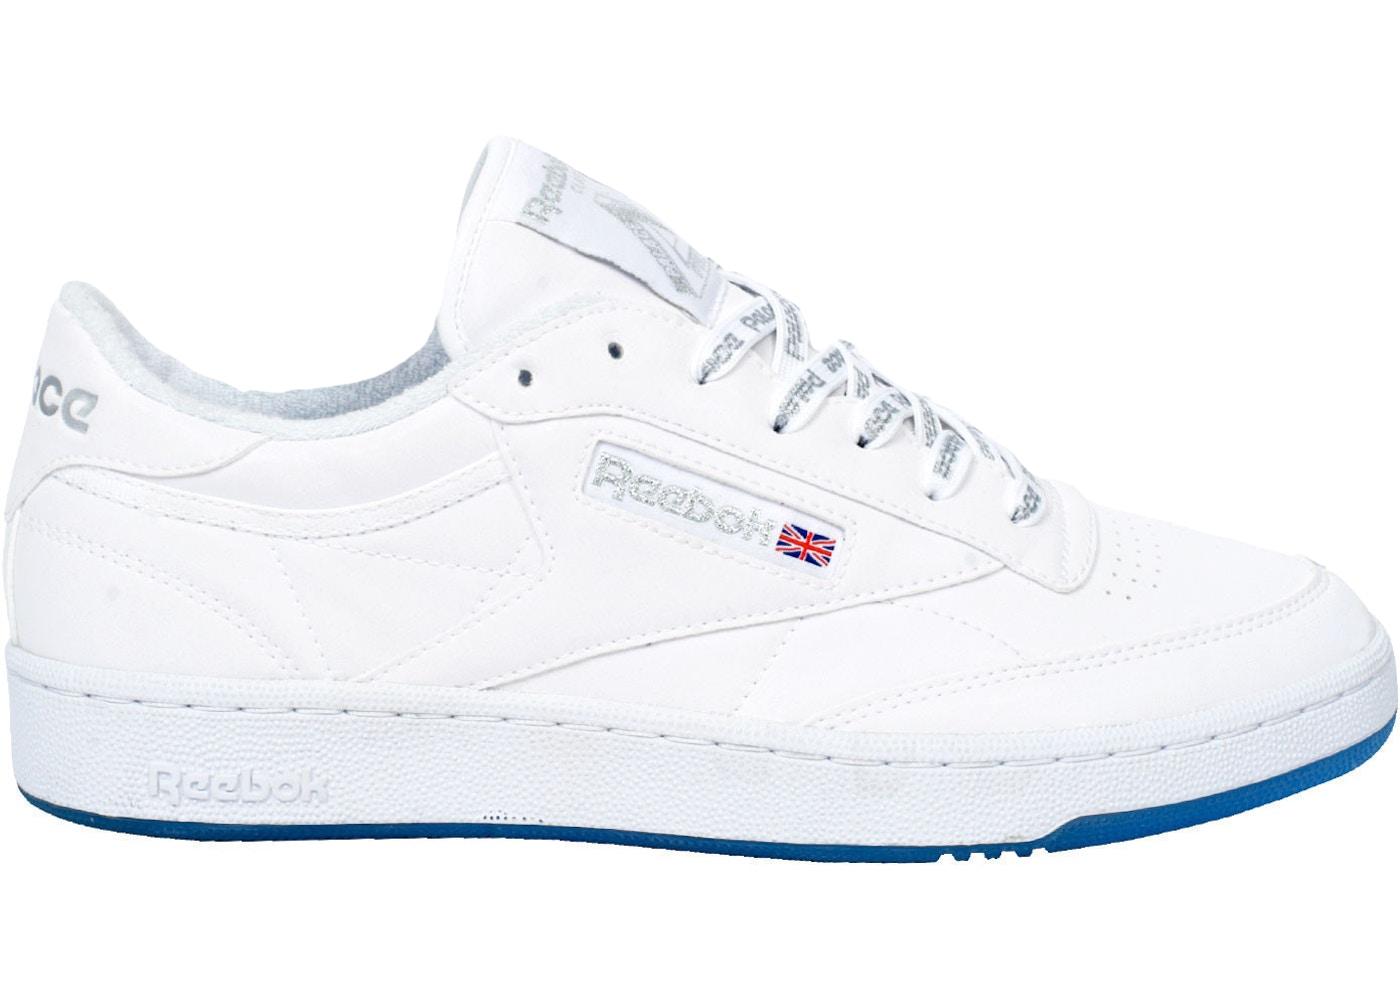 d1c8022f975 Reebok Club C White - AQ9737